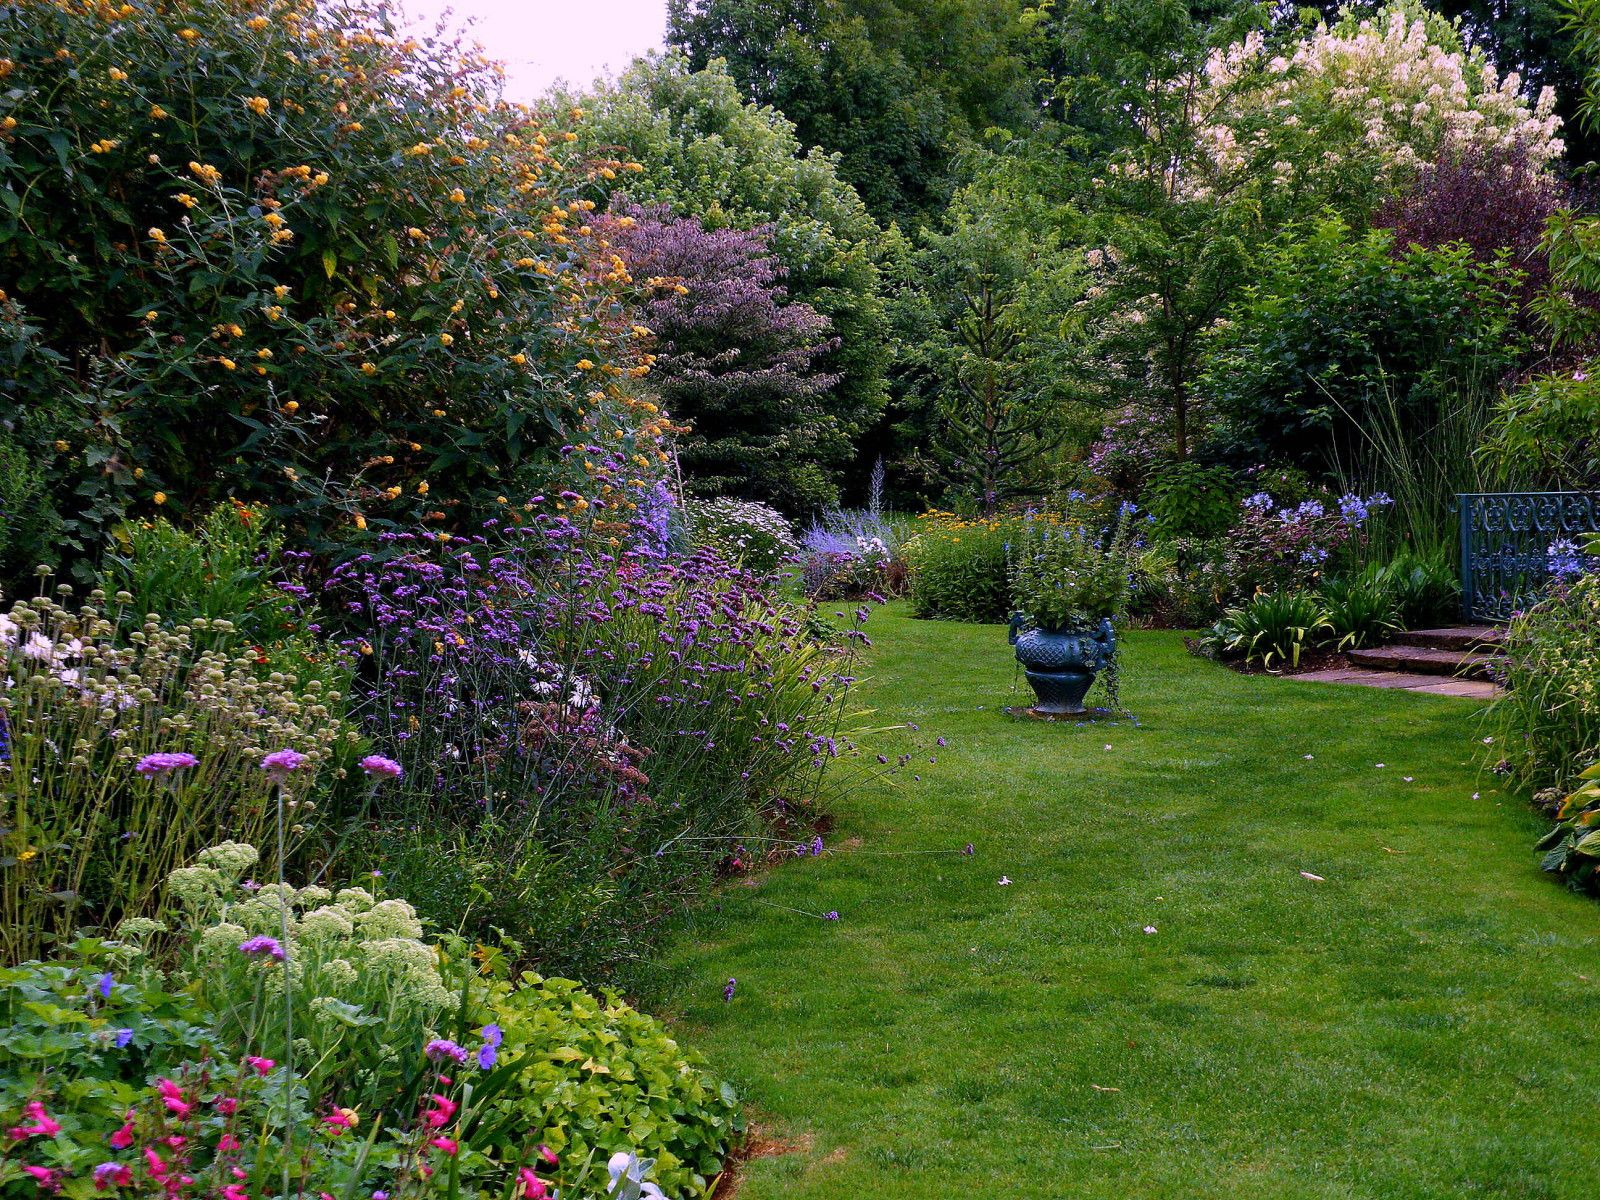 Jardin l 39 anglaise plan recherche google jardin for Haie jardin anglais